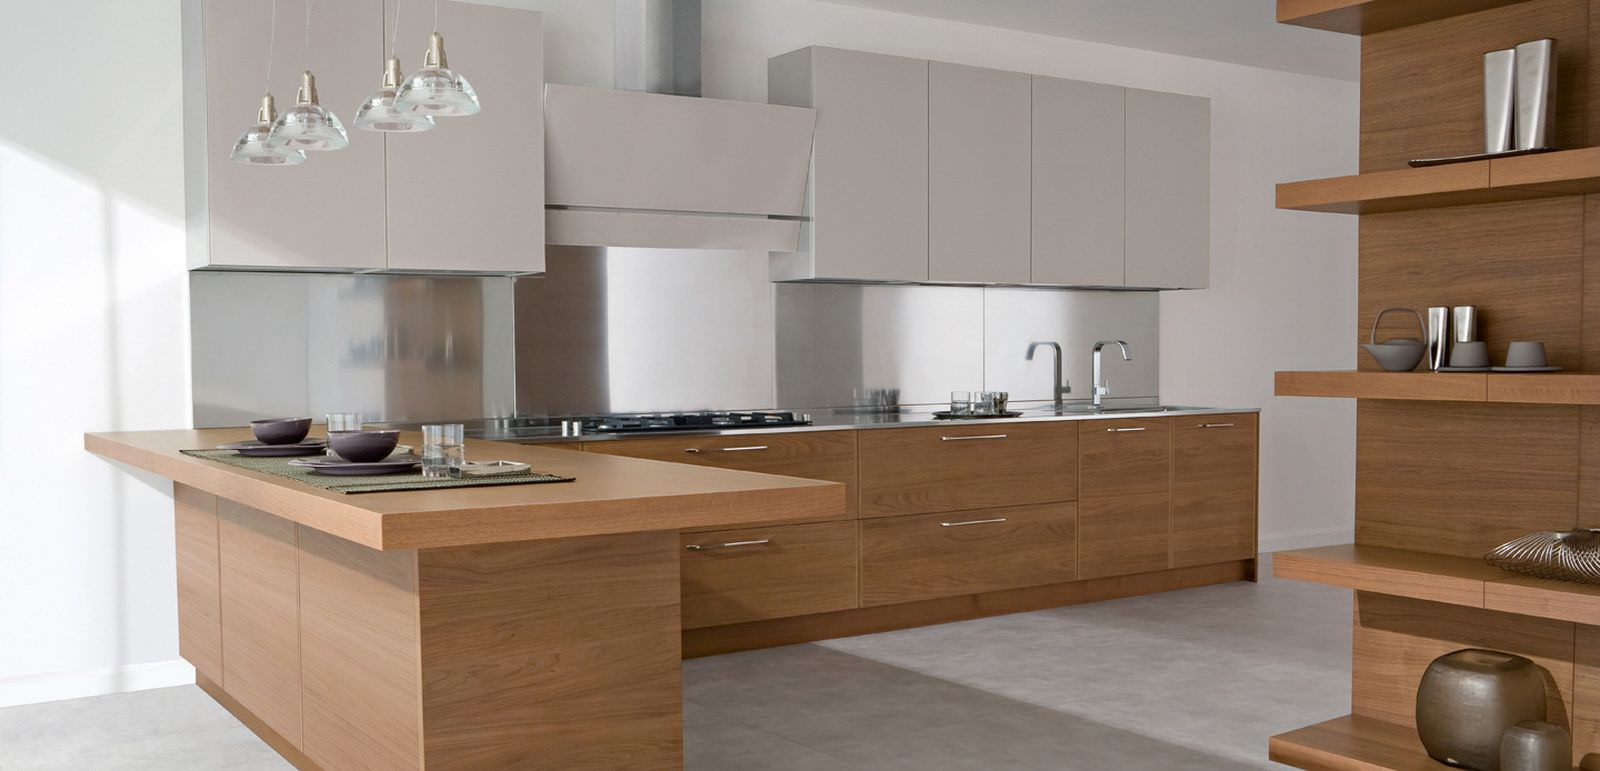 Cucine Moderne In Legno Chiaro.100 Idee Cucine Moderne In Legno Bianche Nere Colorate